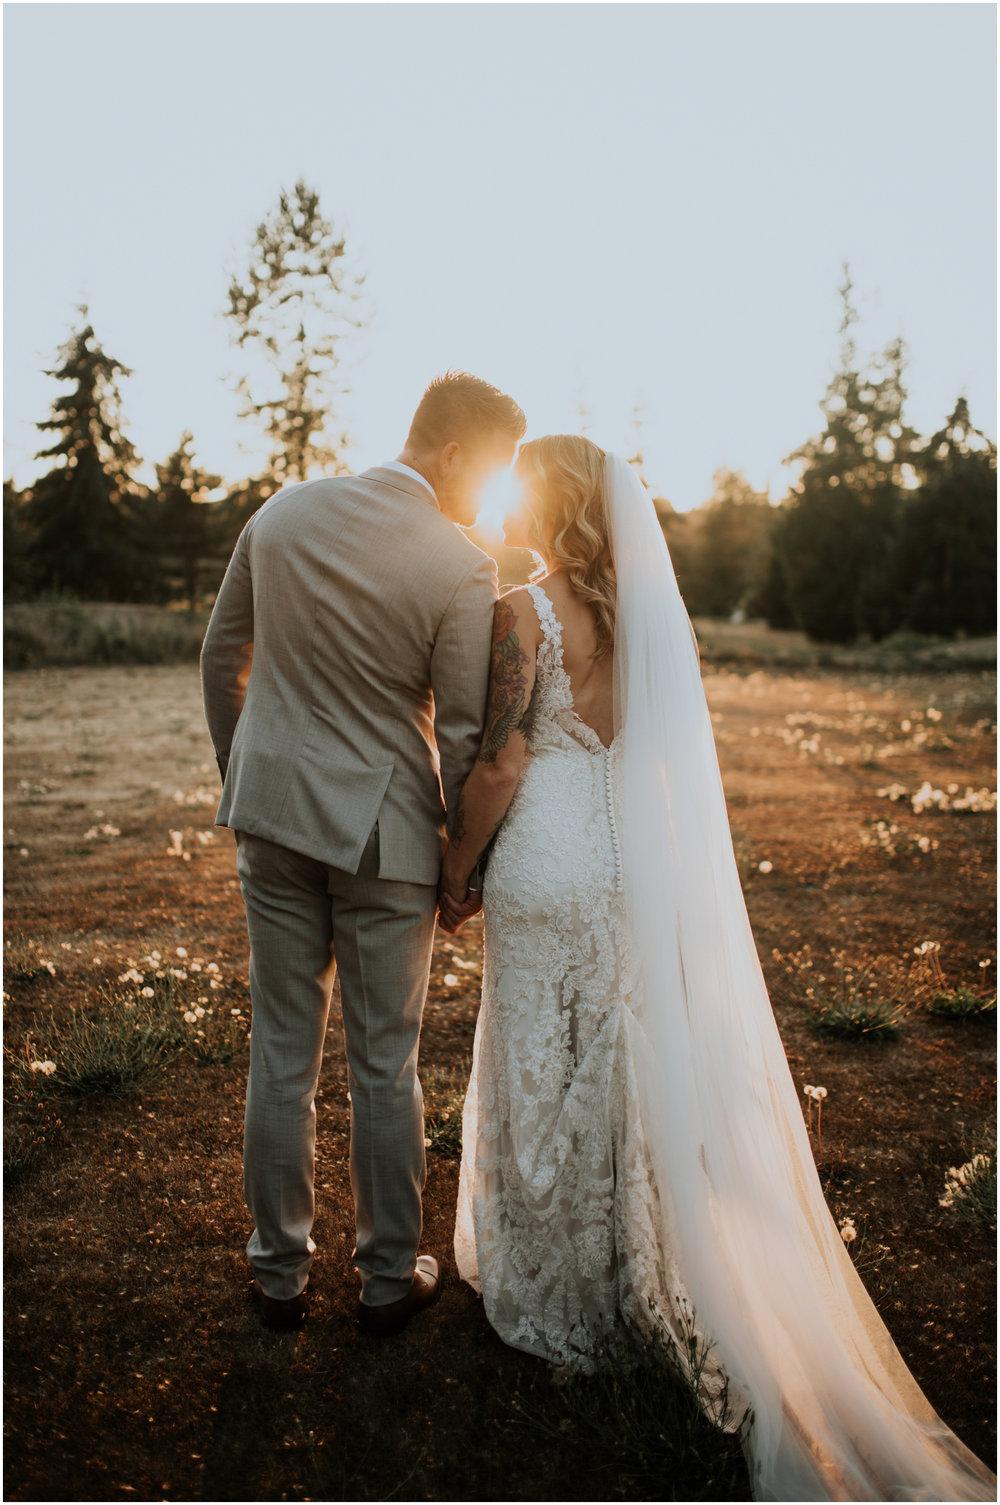 mona-and-matthew-the-kelley-farm-wedding-seattle-washington-wedding-photographer-121.jpg